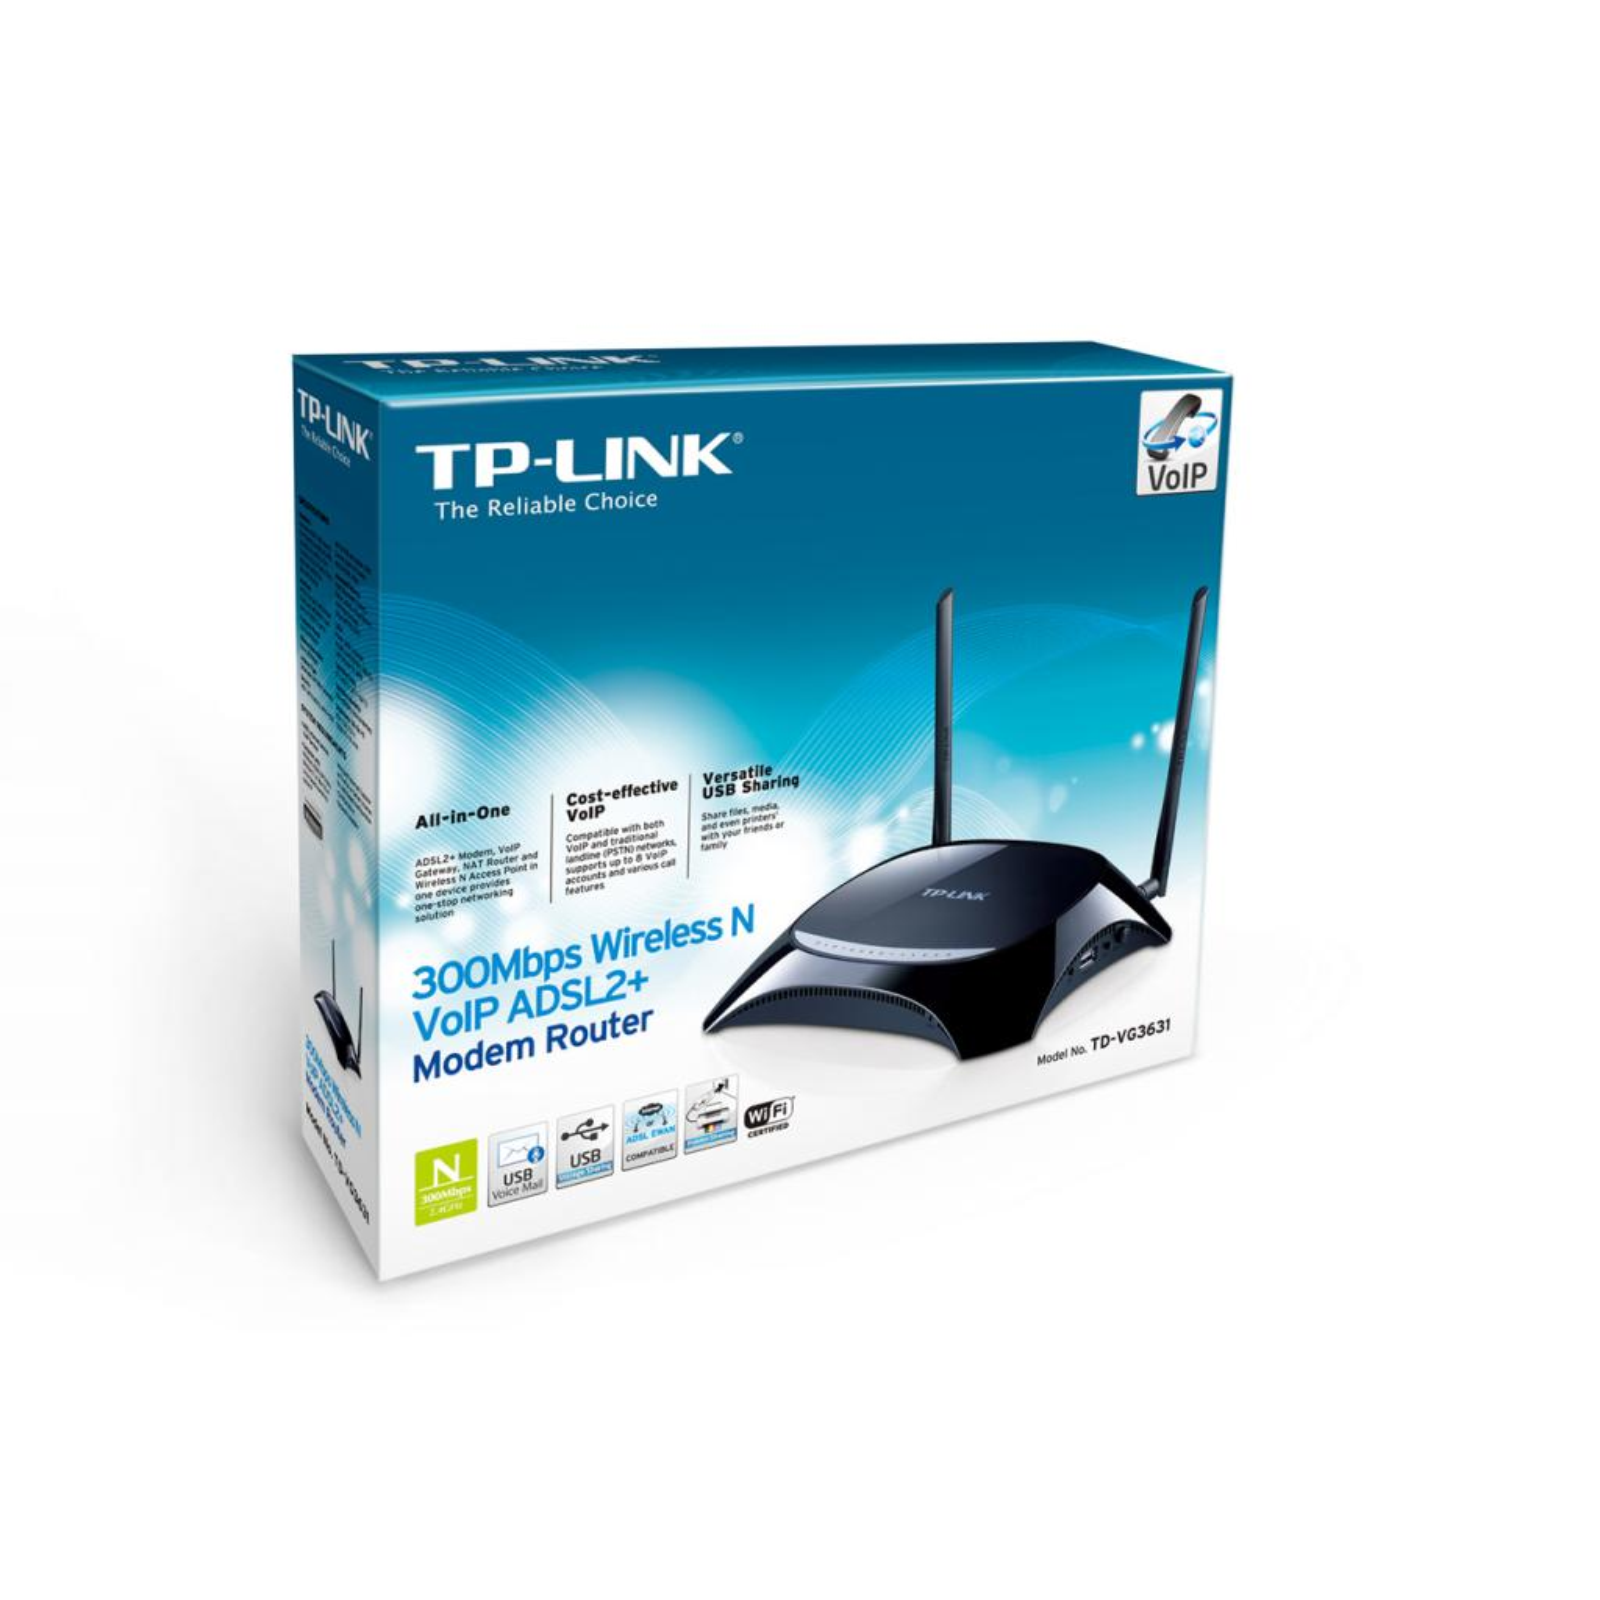 Маршрутизатор TP-Link TD-VG3631 изображение 7